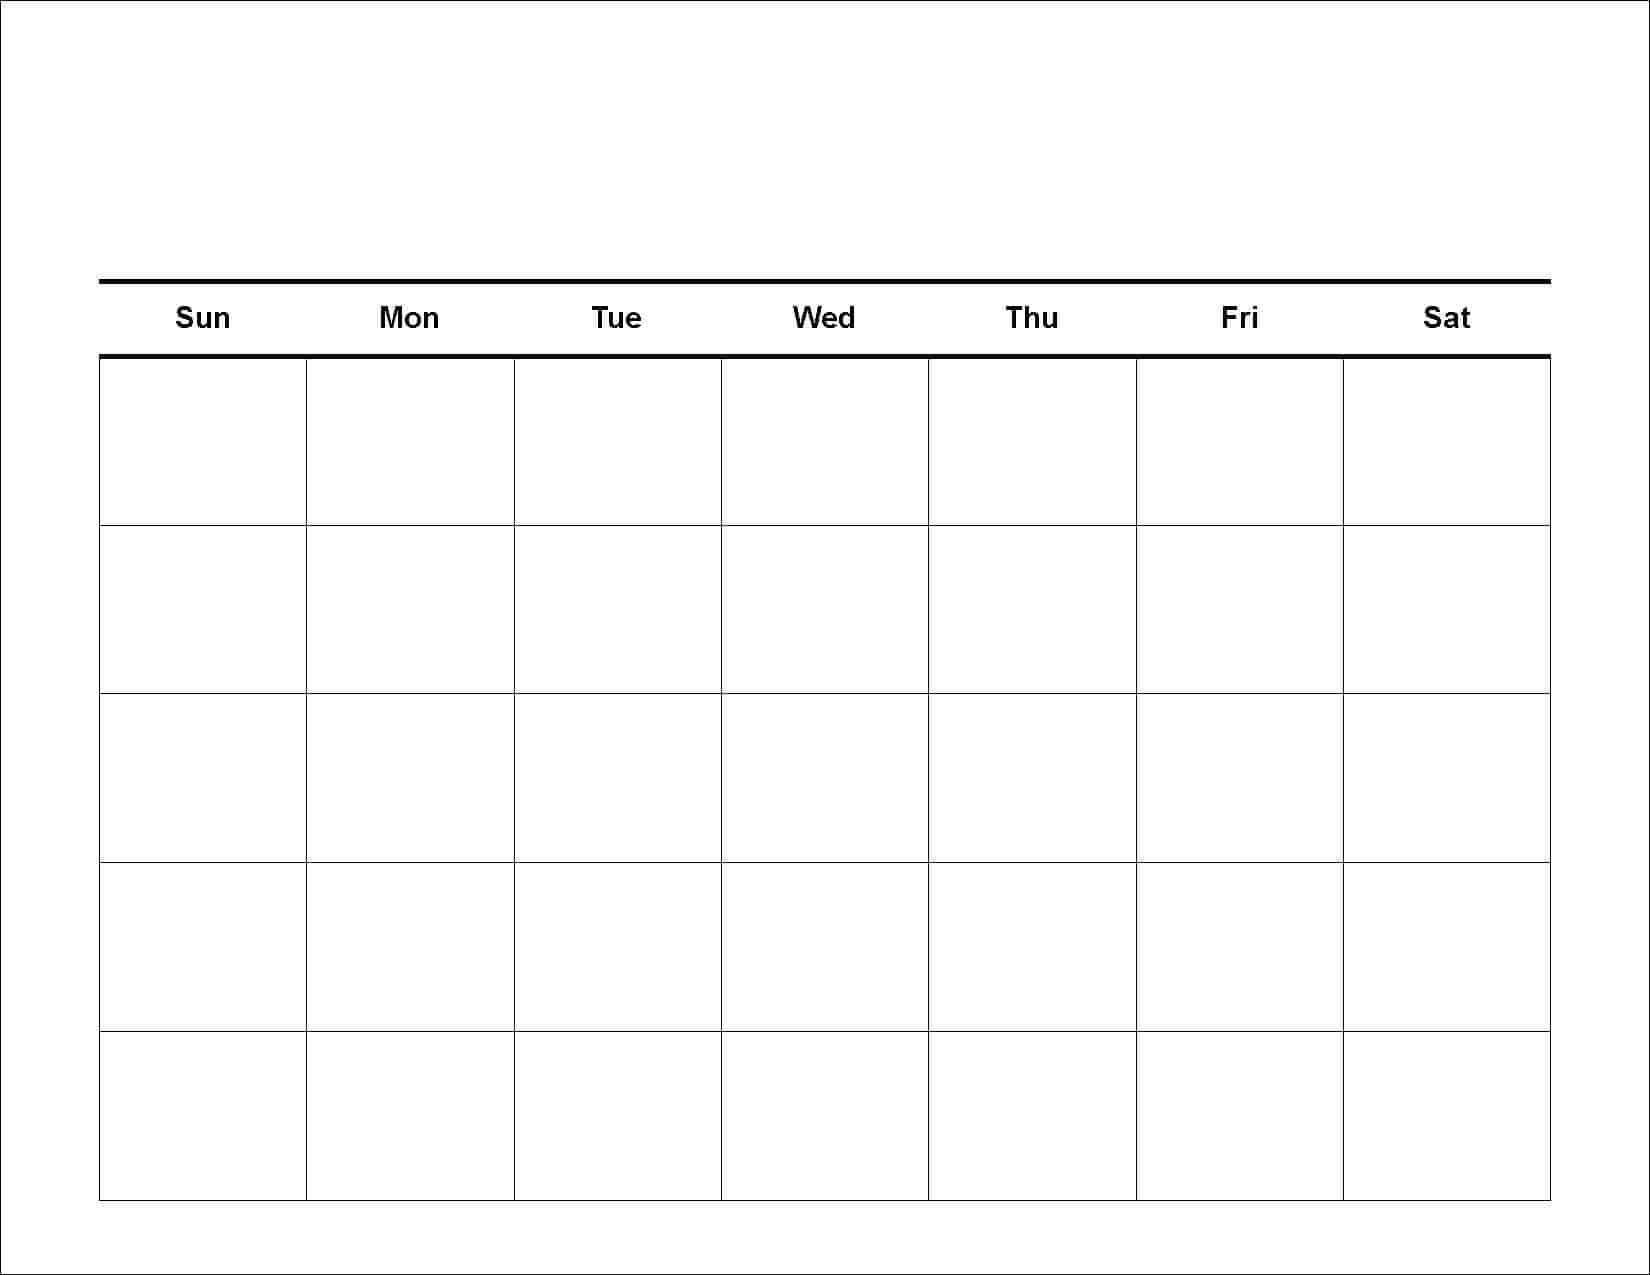 30 Day Blank Calendar Printable - Agadi.ifreezer.co